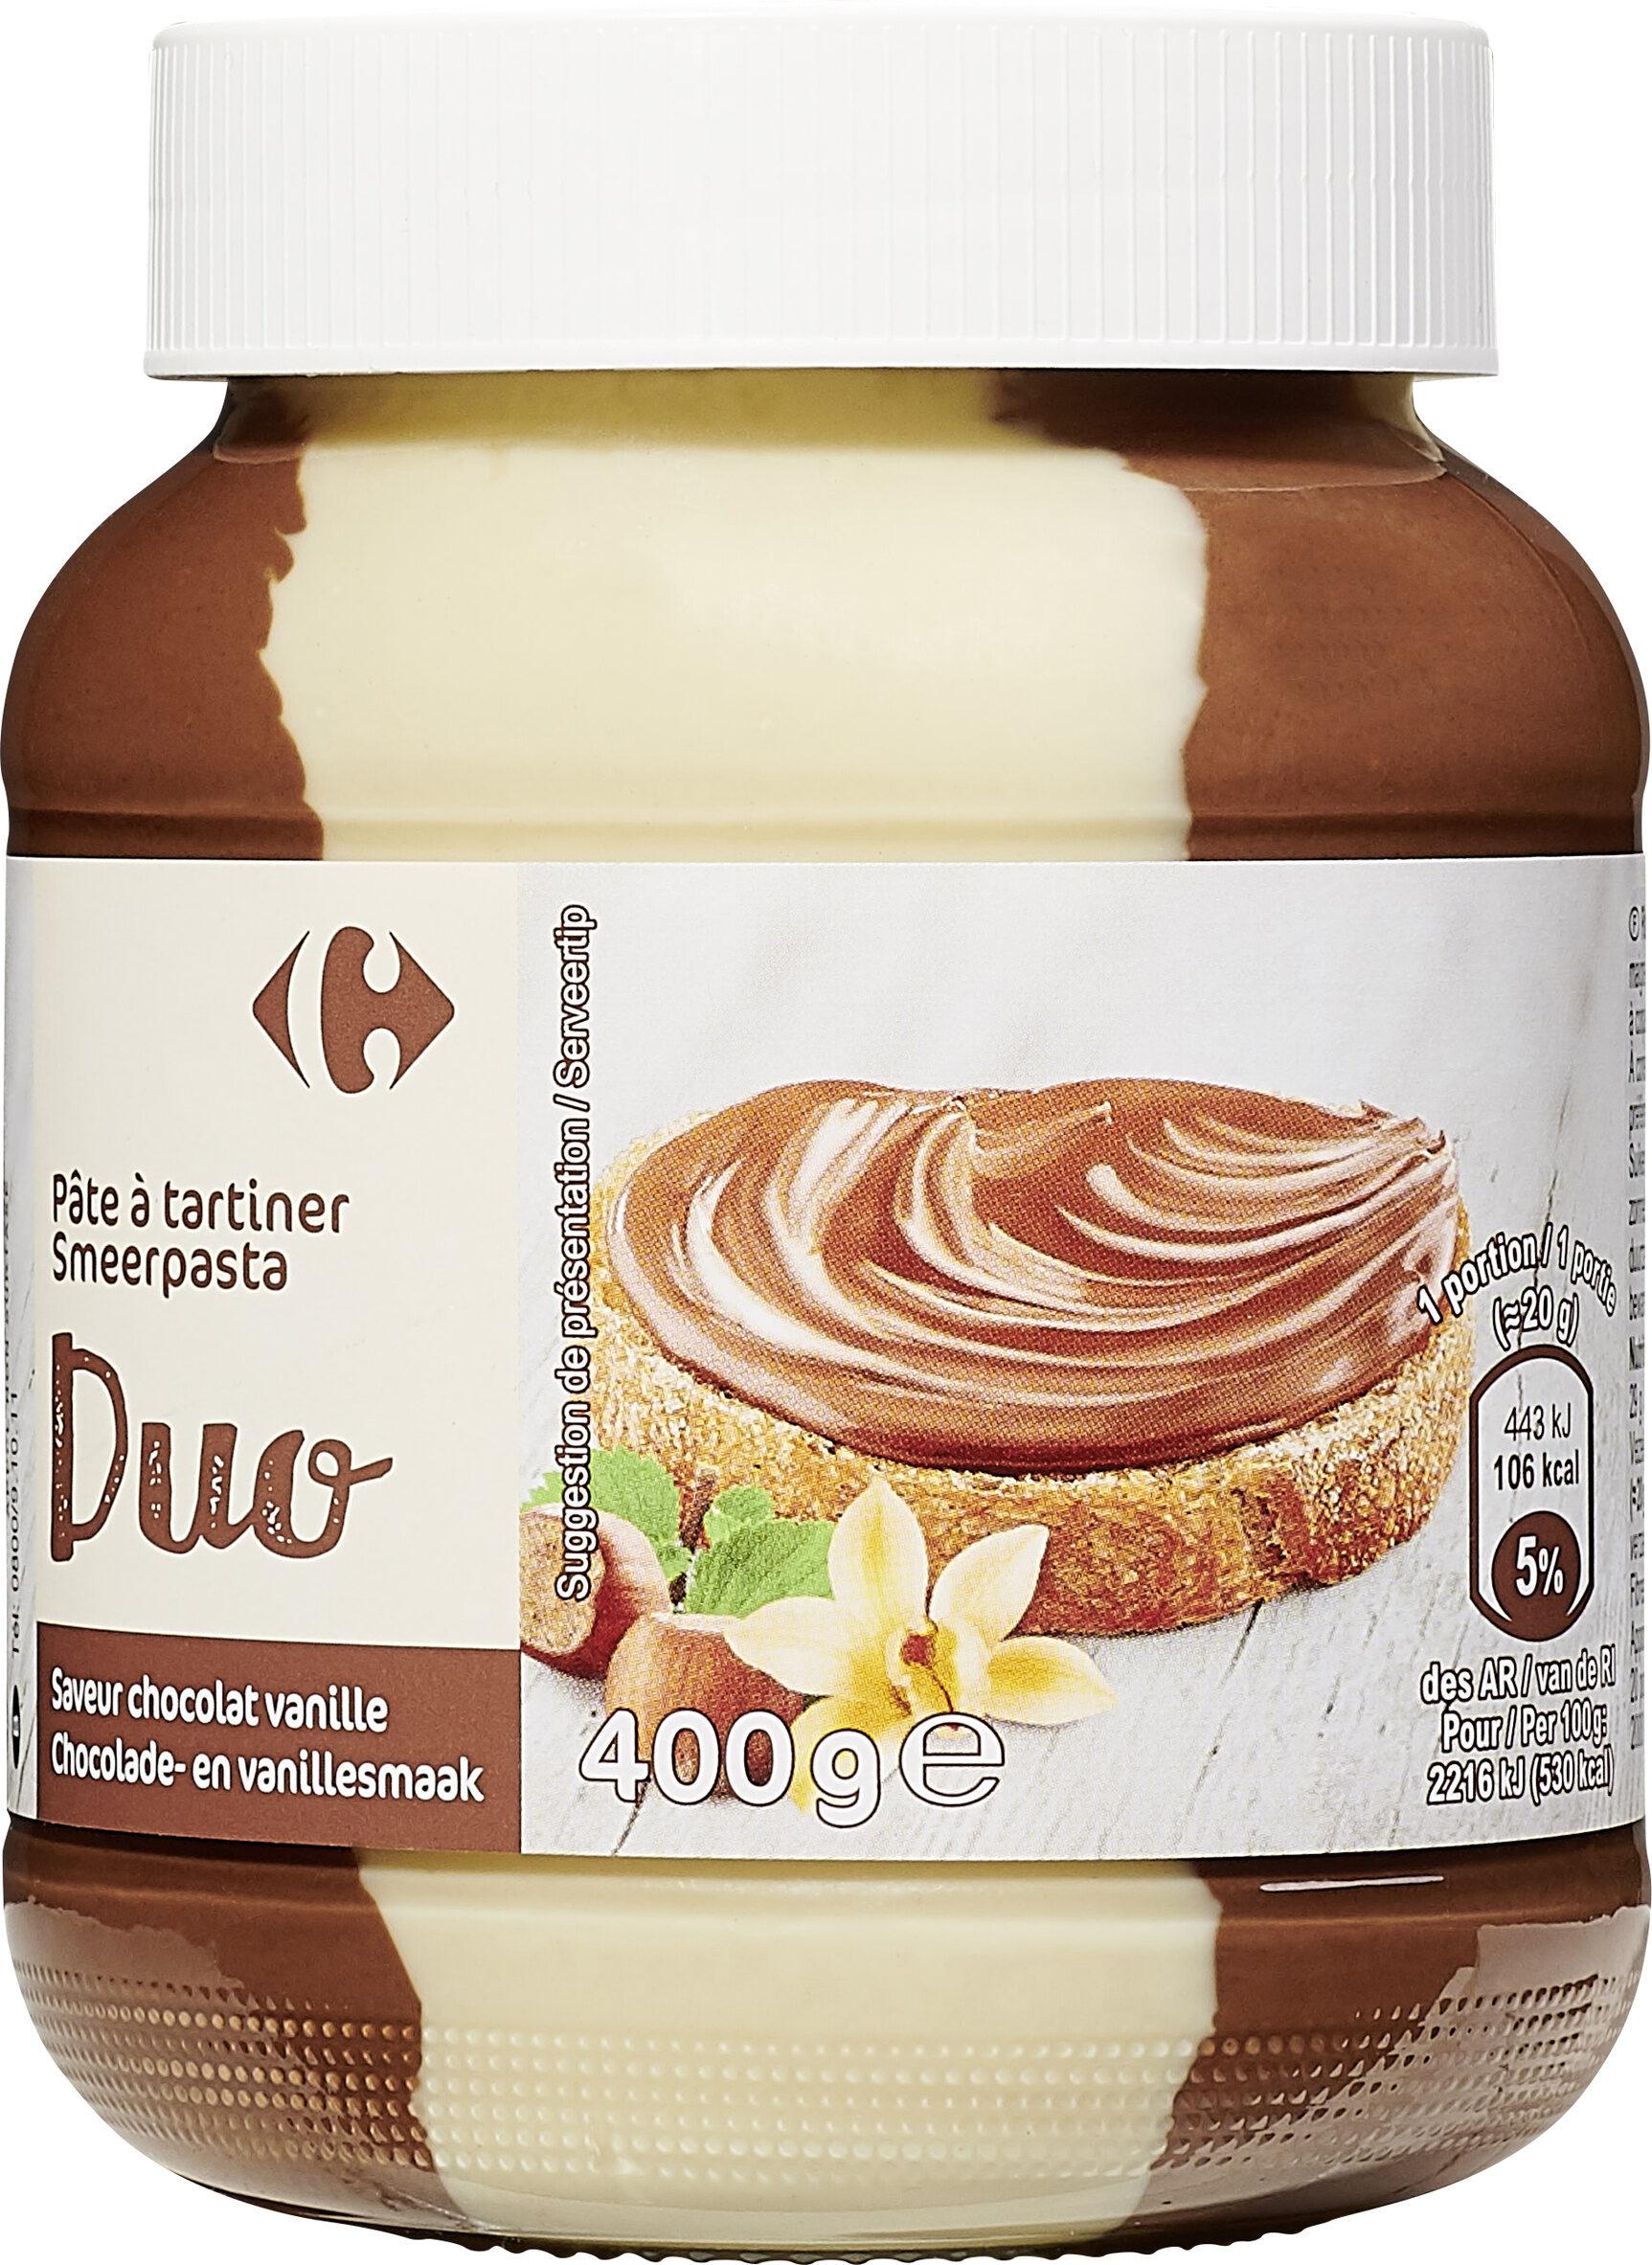 Pâte à tartiner DUO - Product